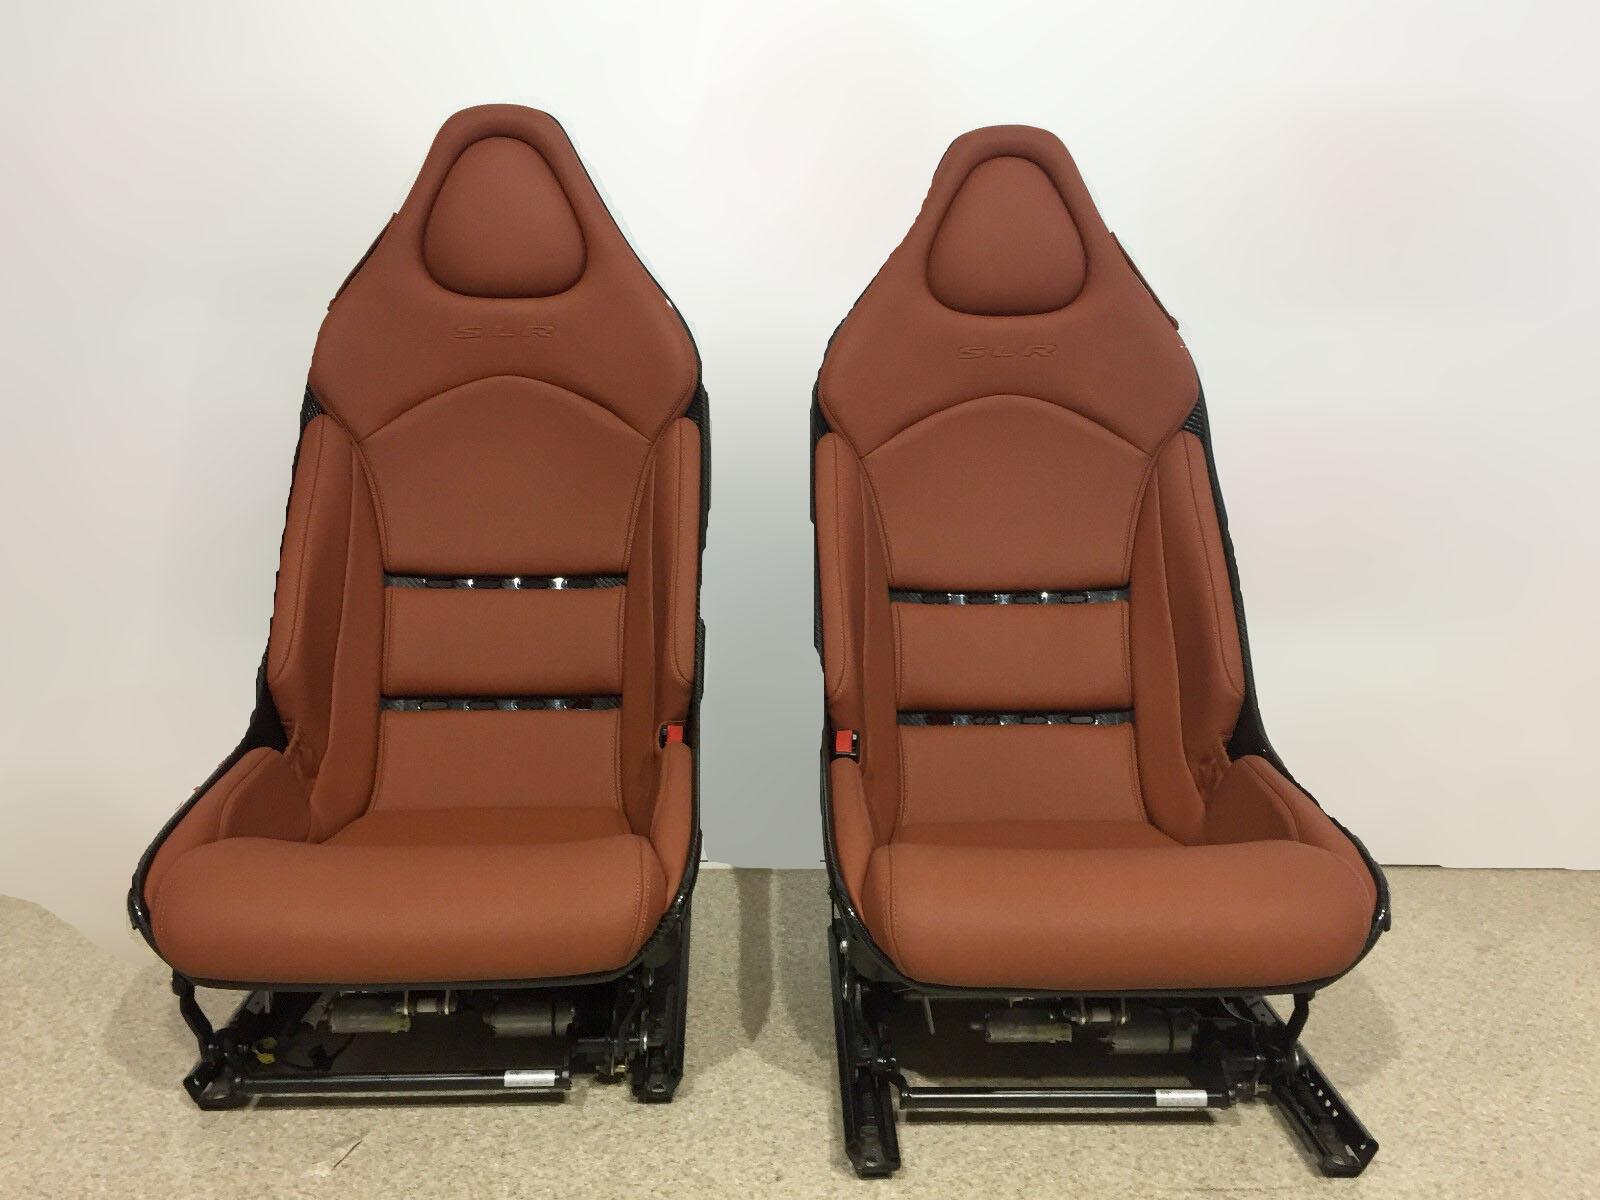 Mercedes SLR McLaren Karbonsitze OEM CARBON SEATS NEW